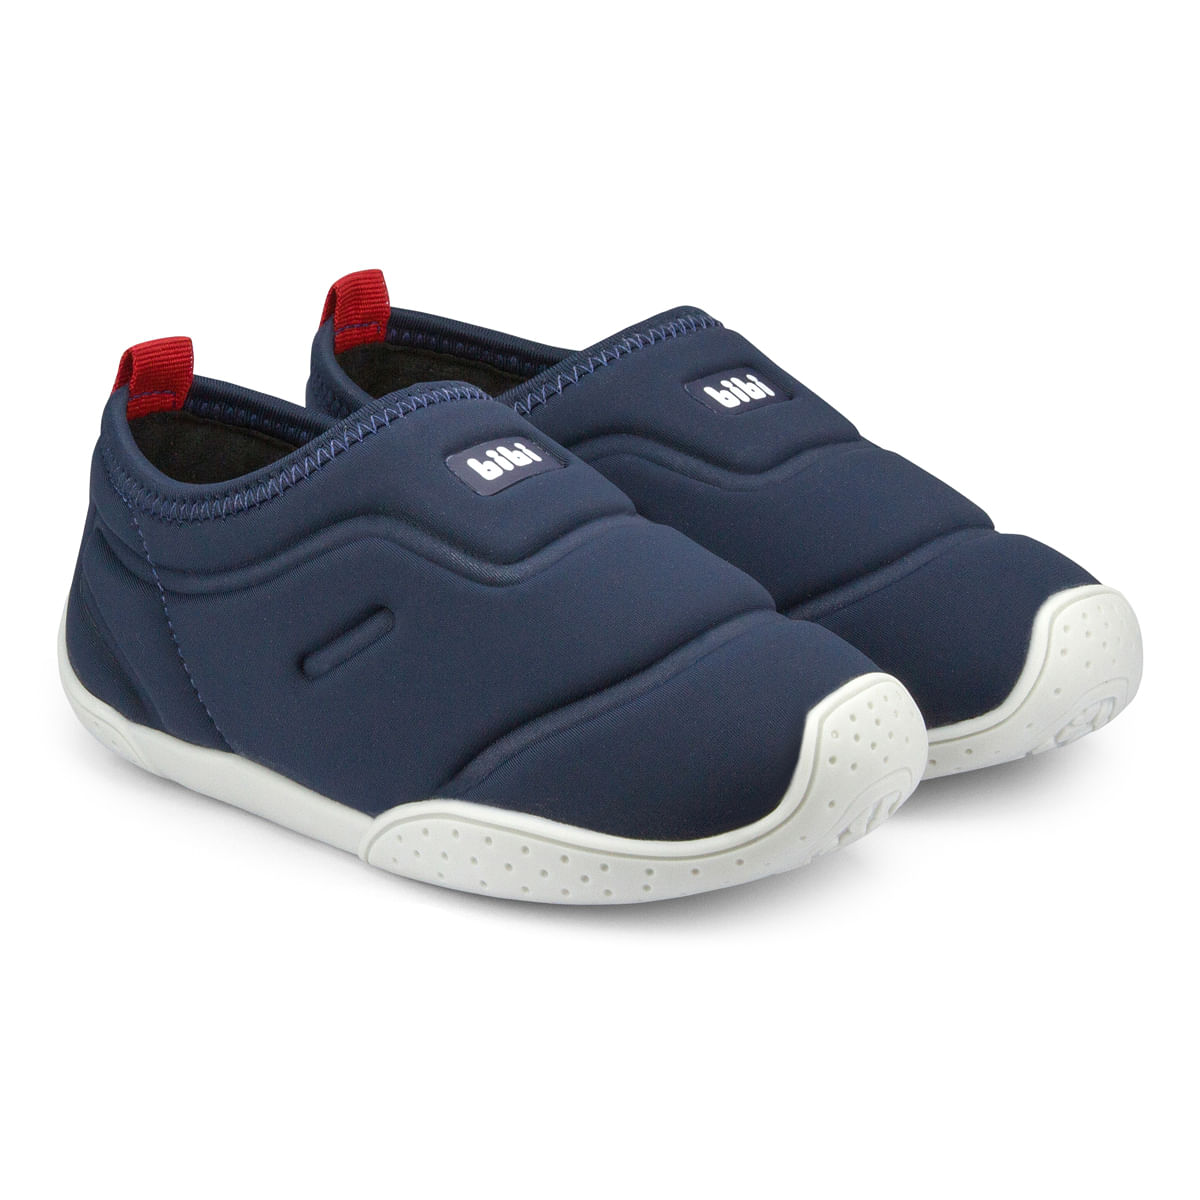 b2b964df13c Tênis Infantil Bibi Masculino Azul Fisioflex 1063097 - Bibi Calçados